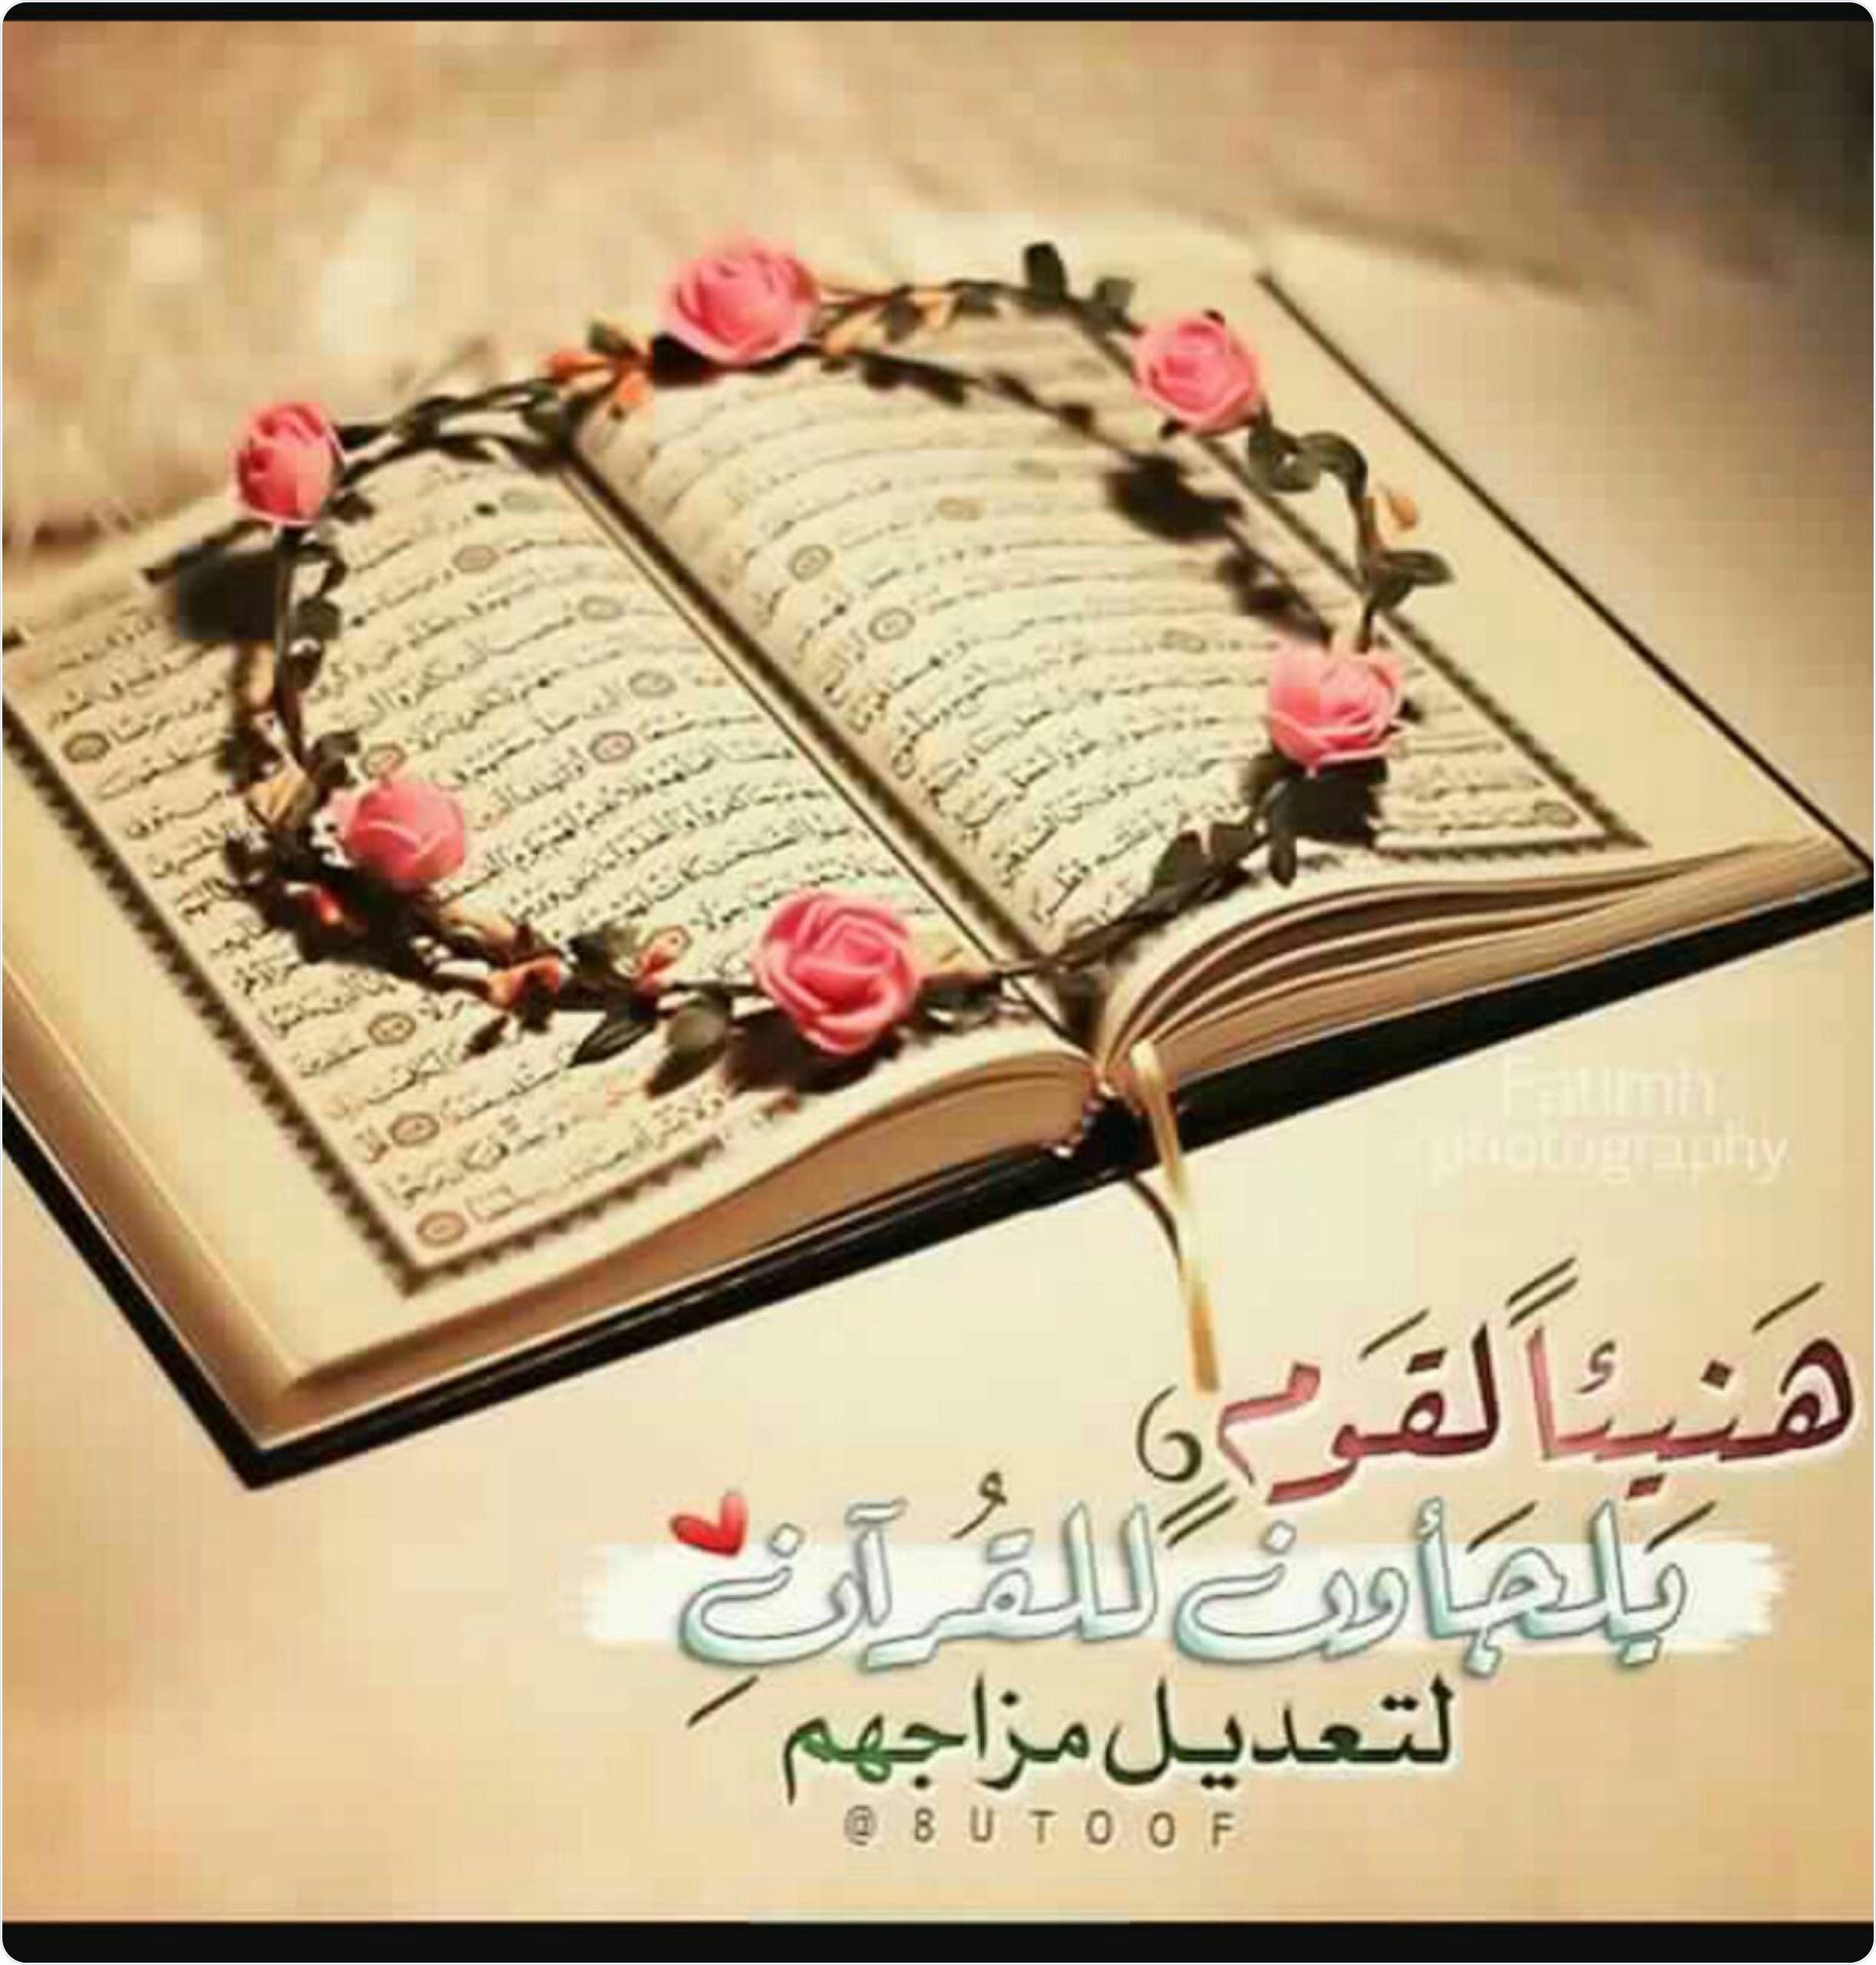 قرآن كريم Quran Quran Verses Islamic Quotes